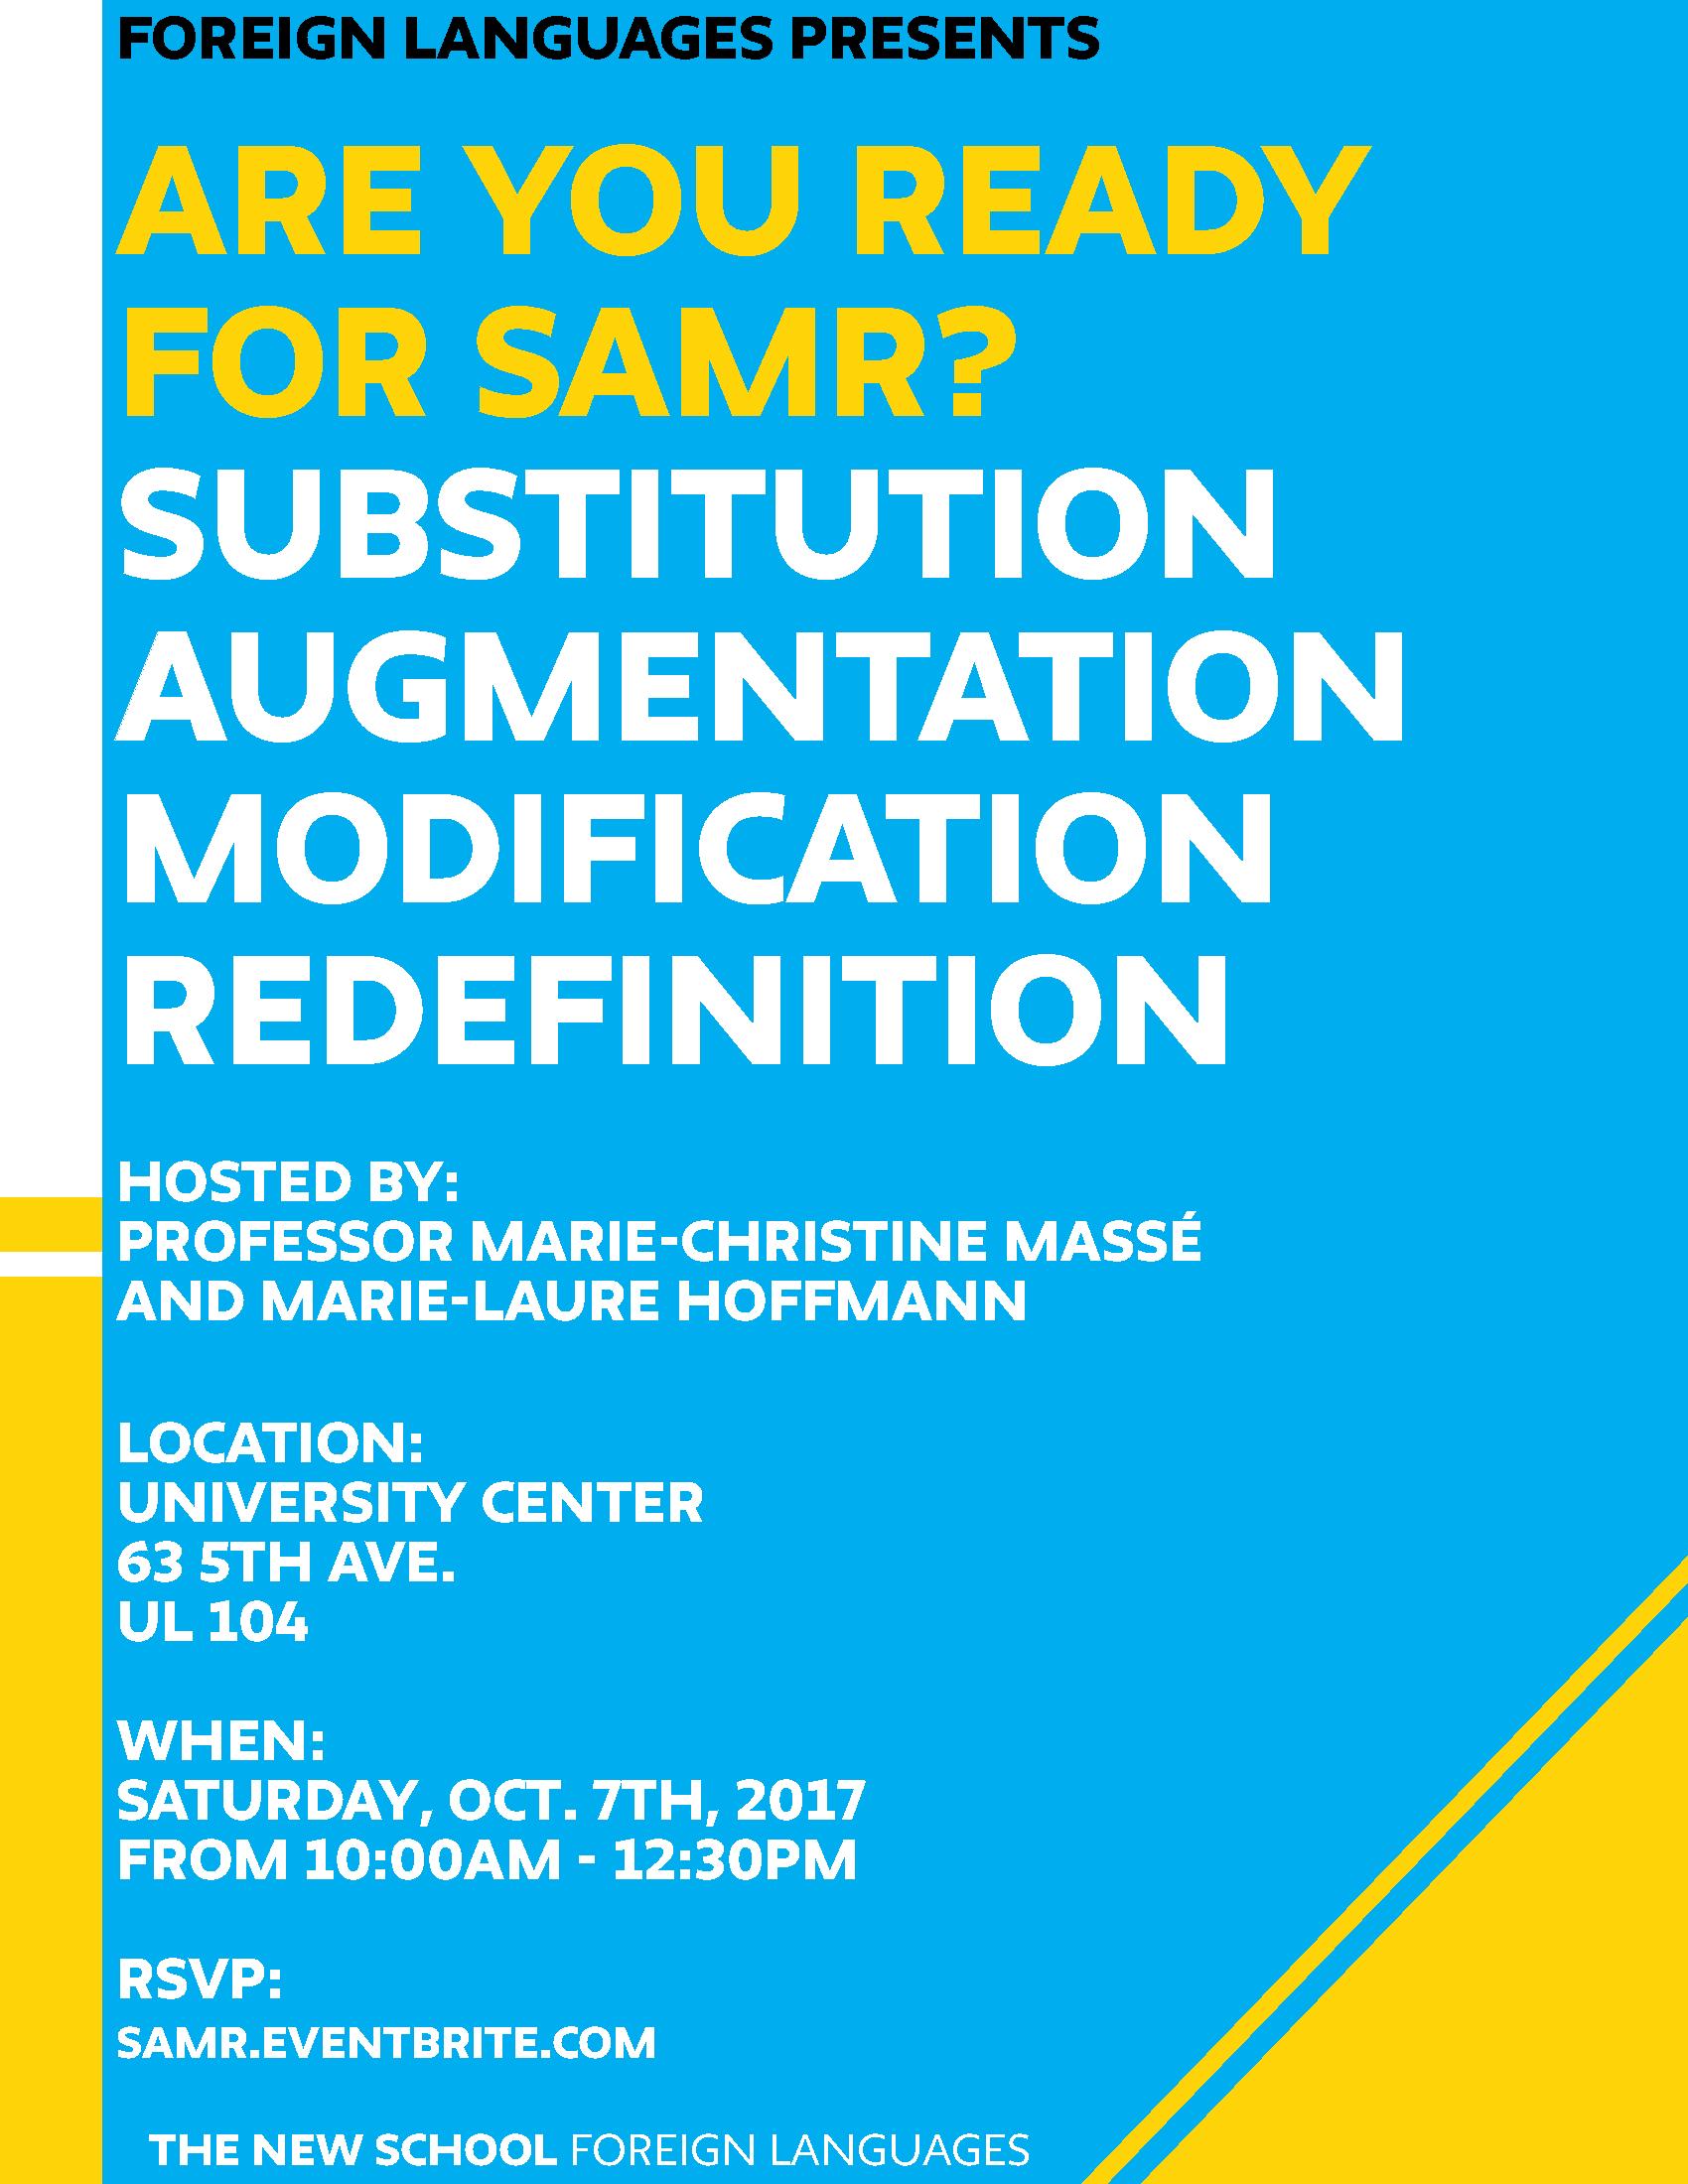 SAMR Poster.png